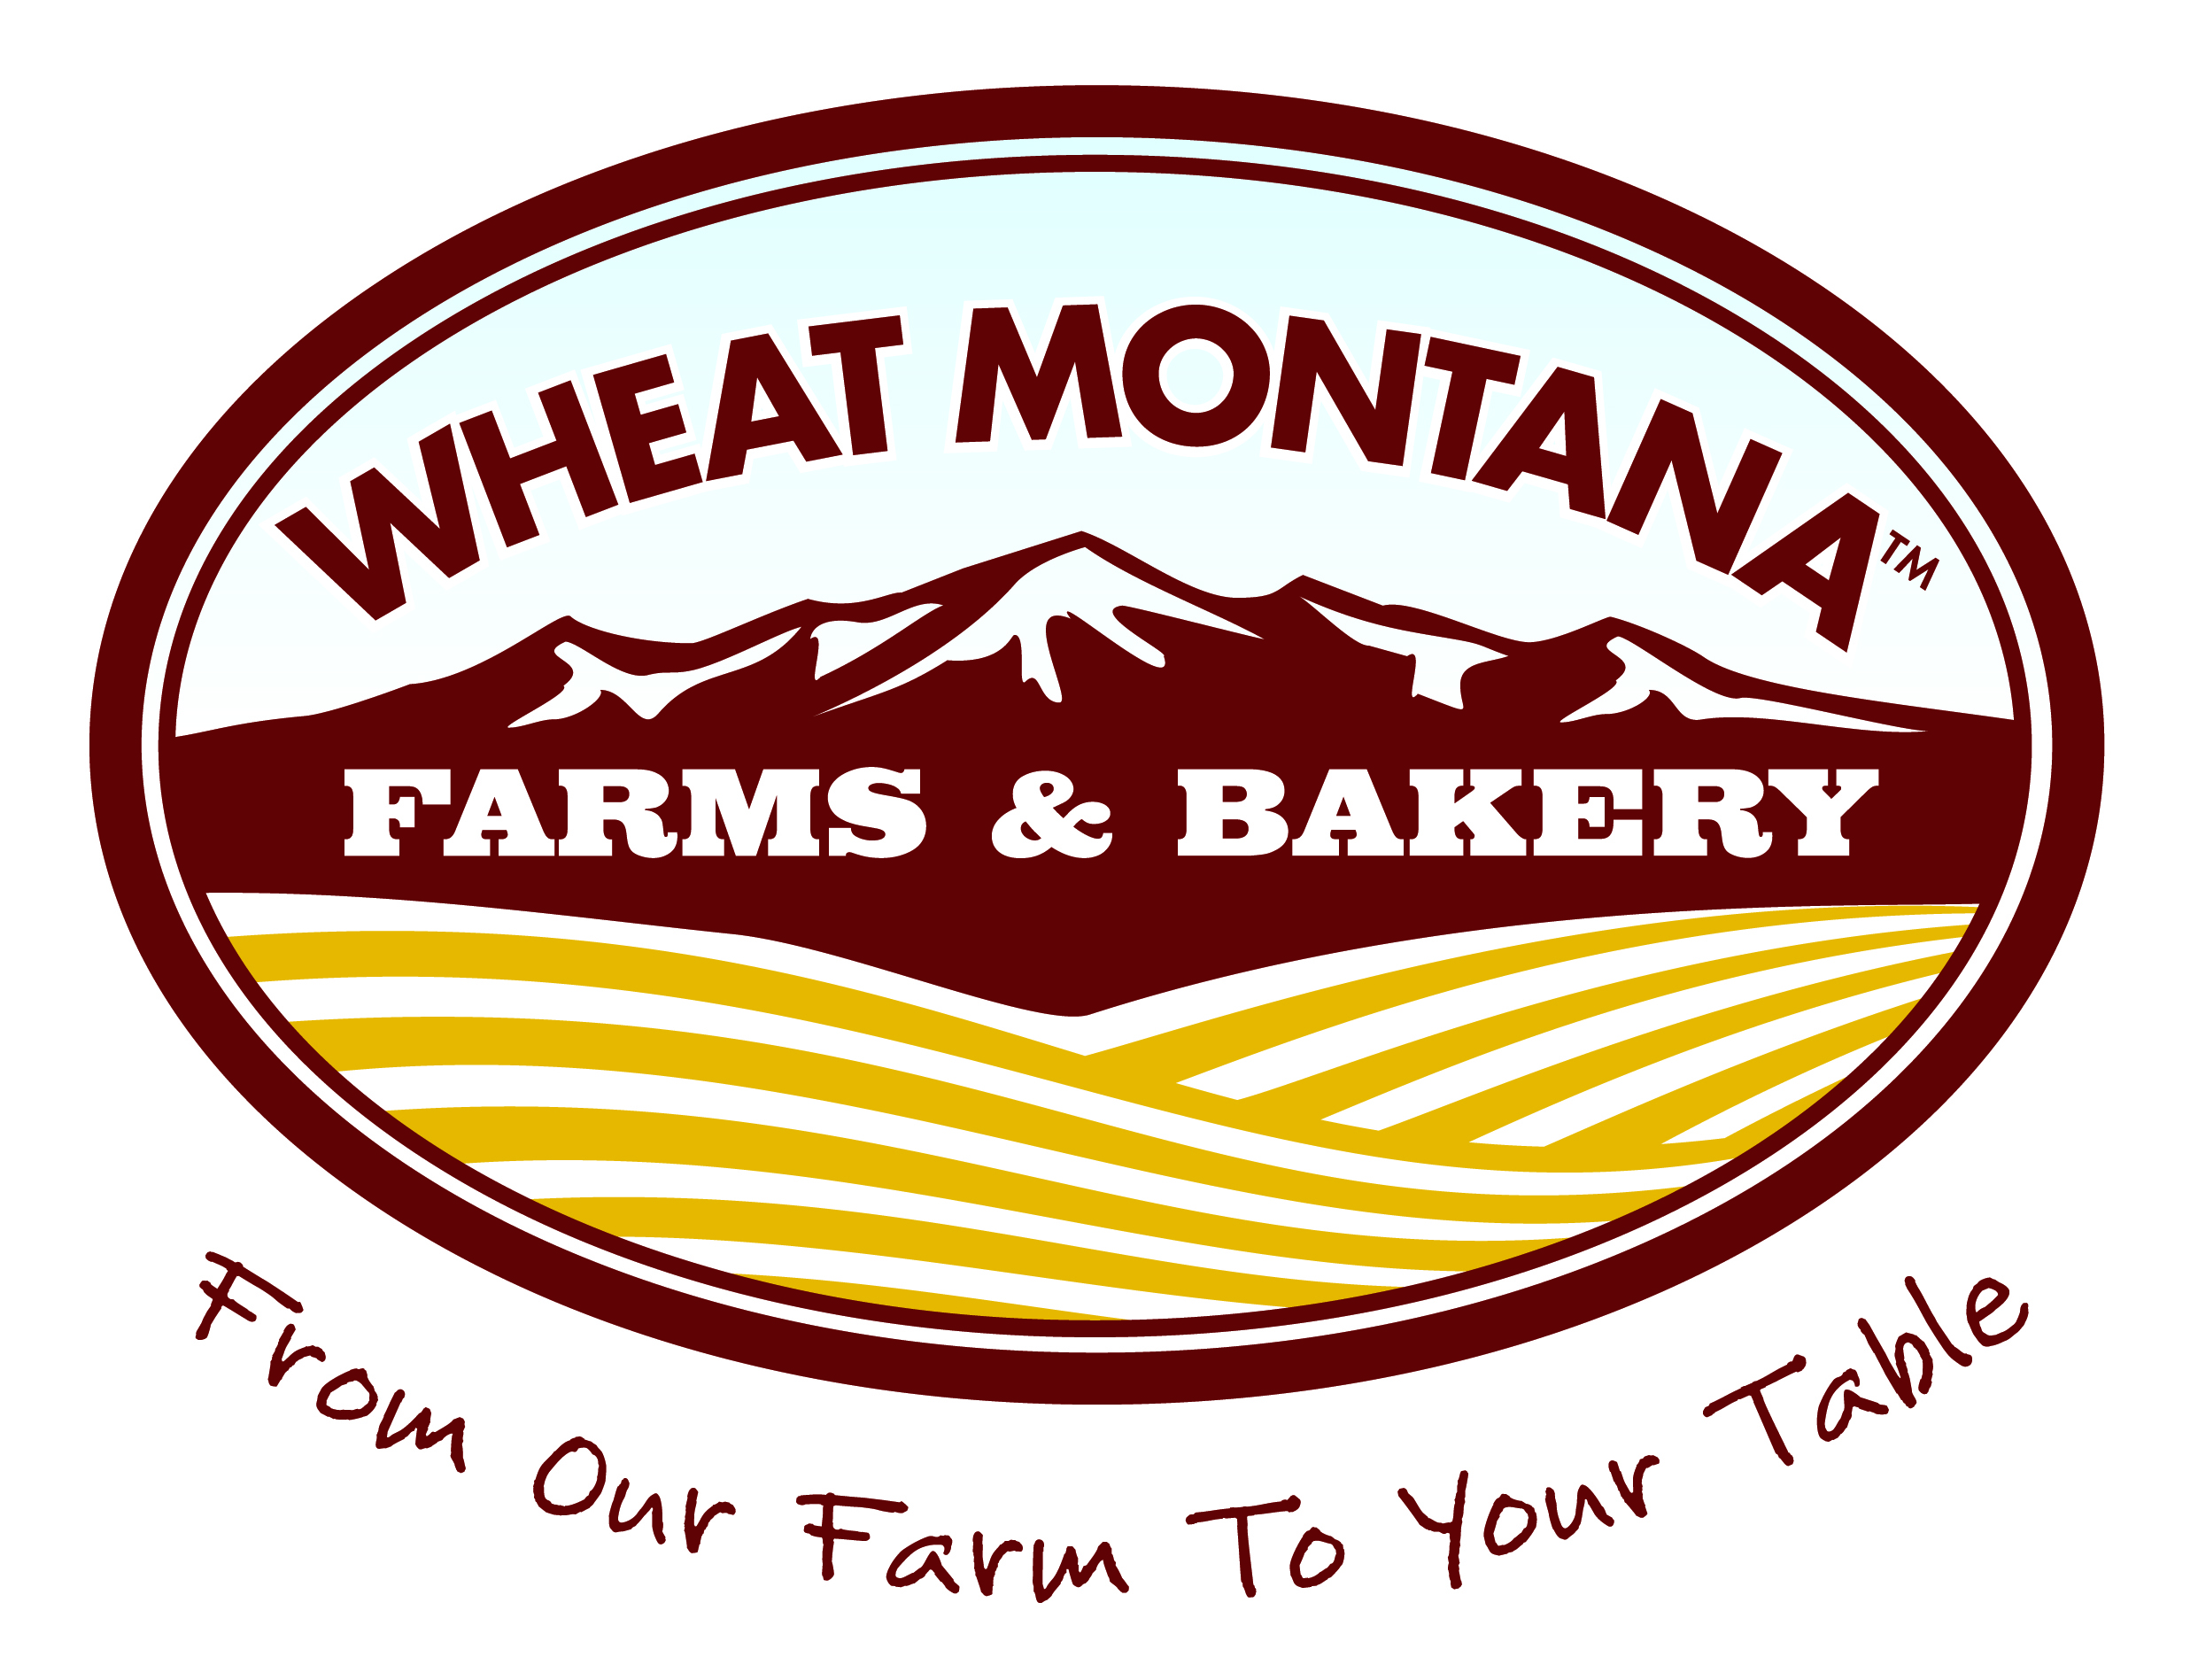 Wheat Montana.jpg